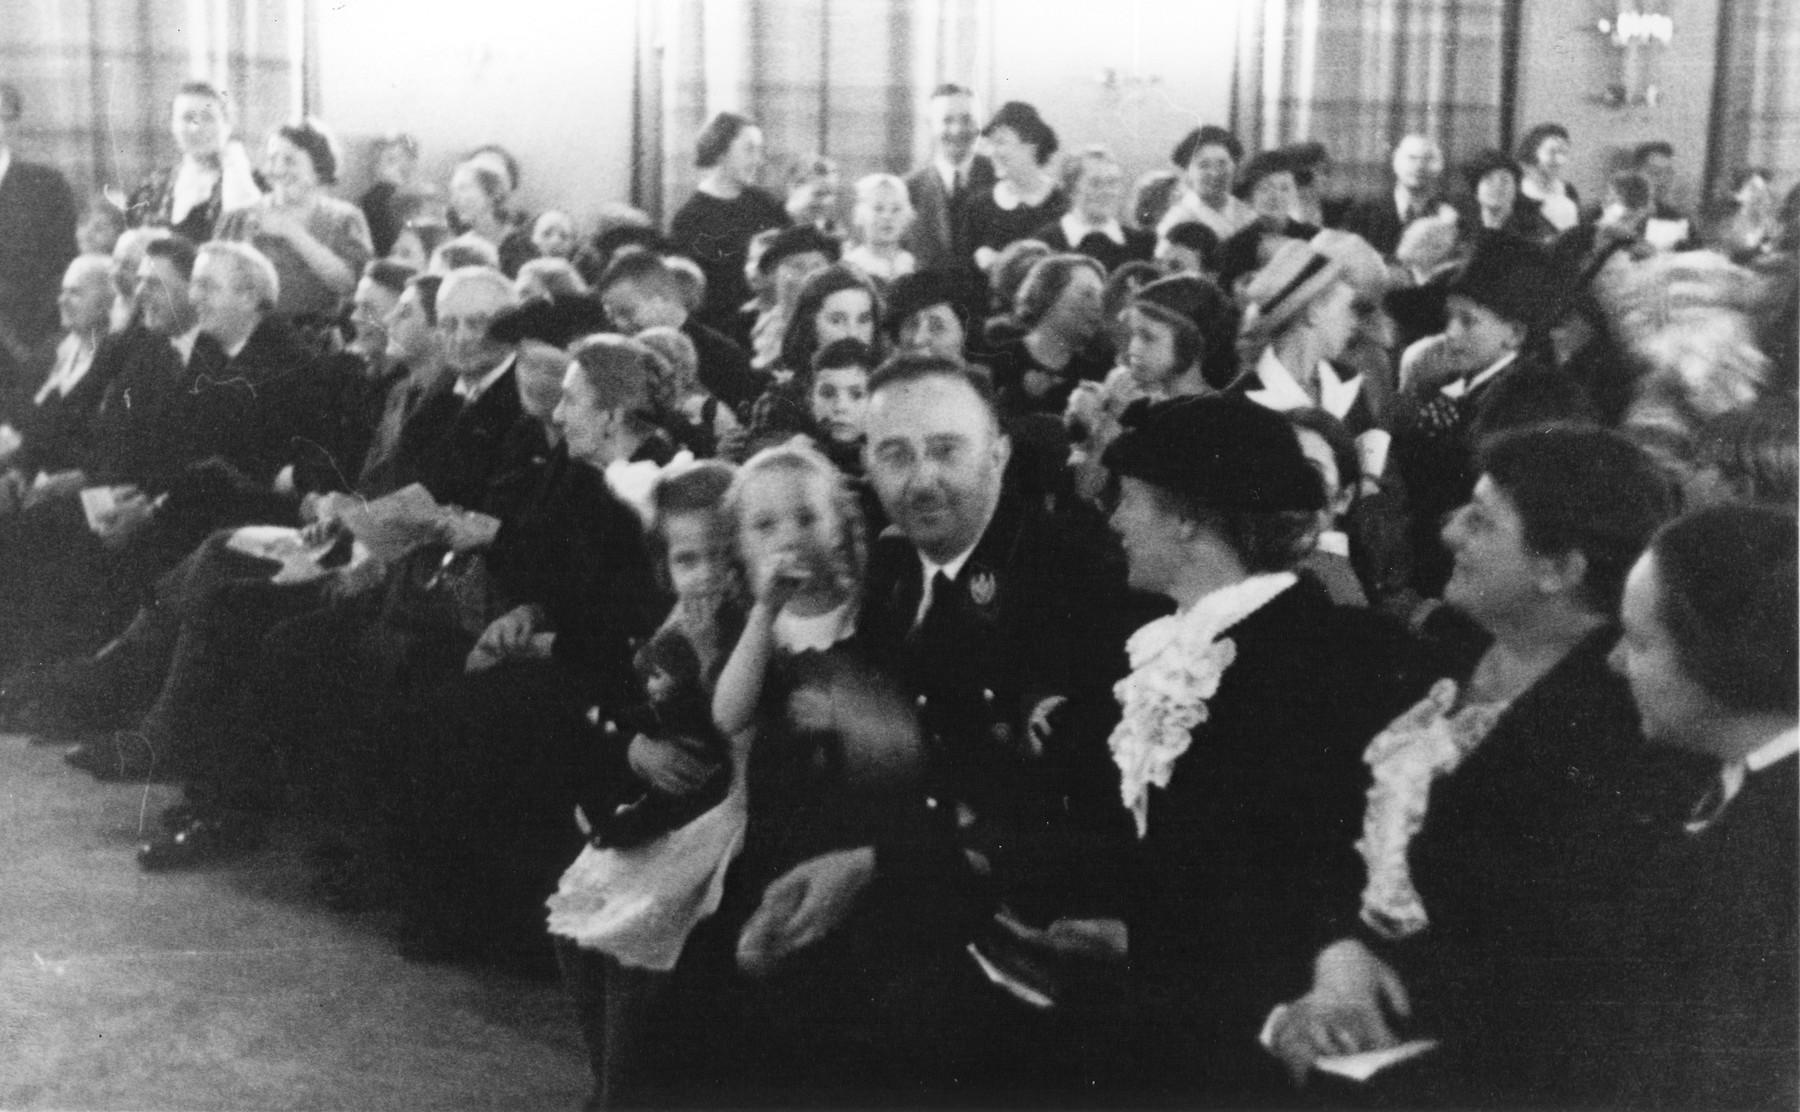 Reichsfuehrer-SS Heinrich Himmler holding his daughter Gudrun at a function at her elementary school in Berlin-Dahlem.